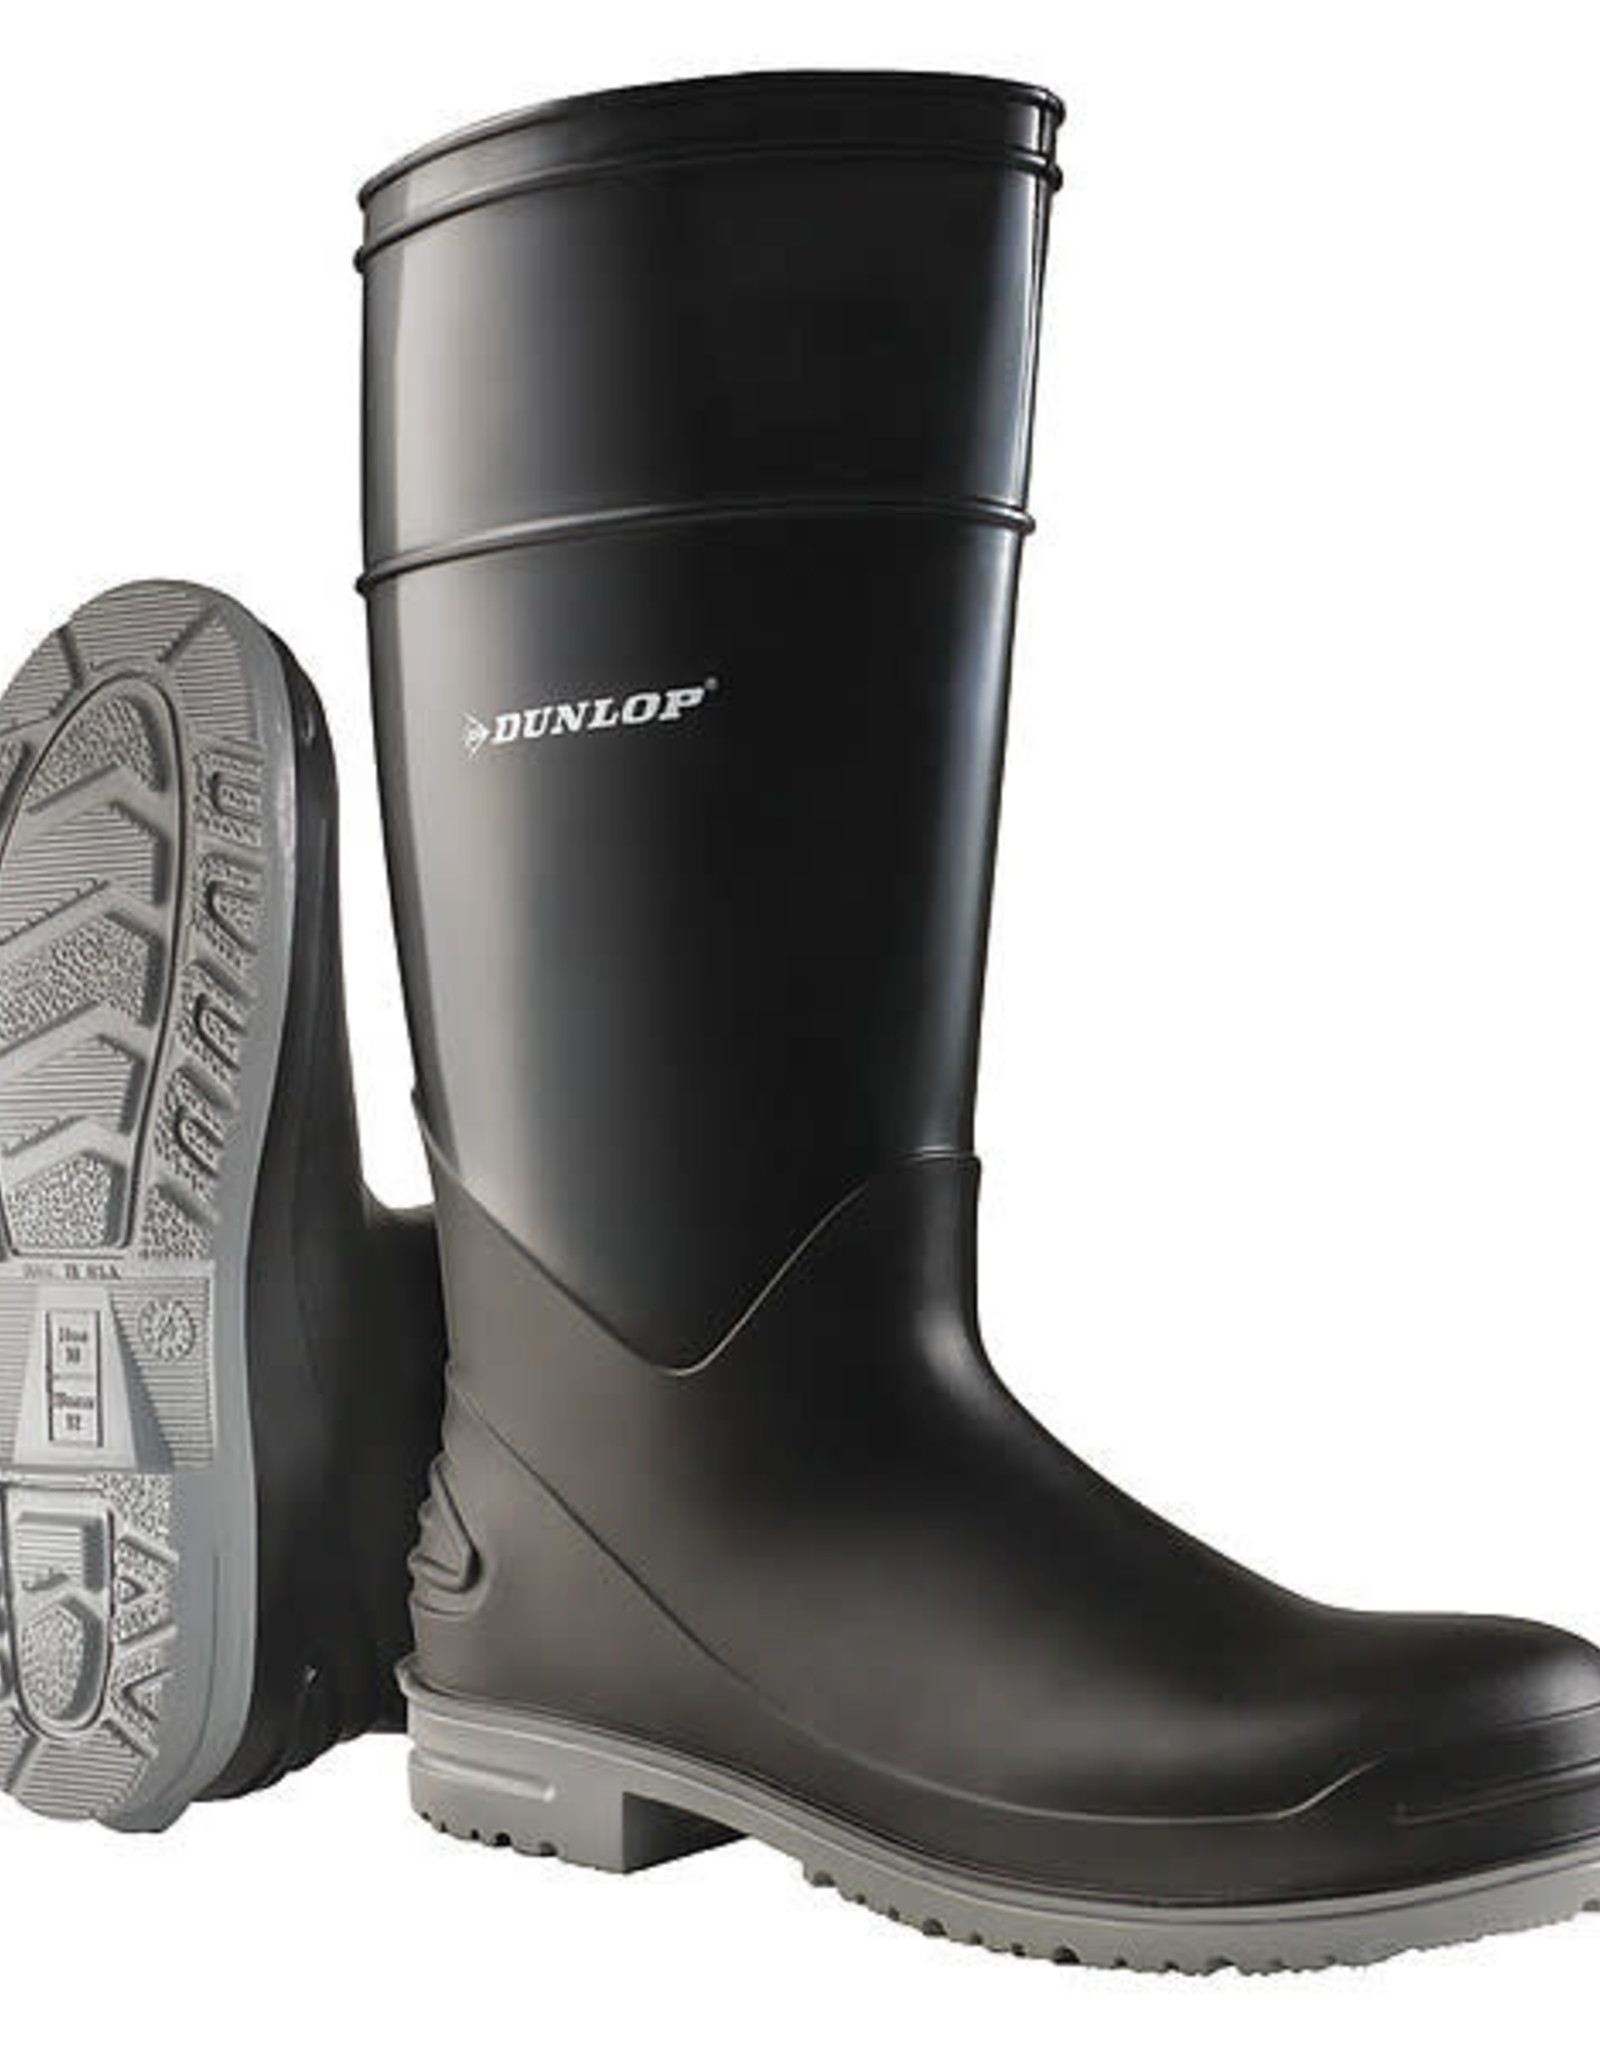 Dunlop Boots, Black Knee High, Steel Toe, SZ. 13